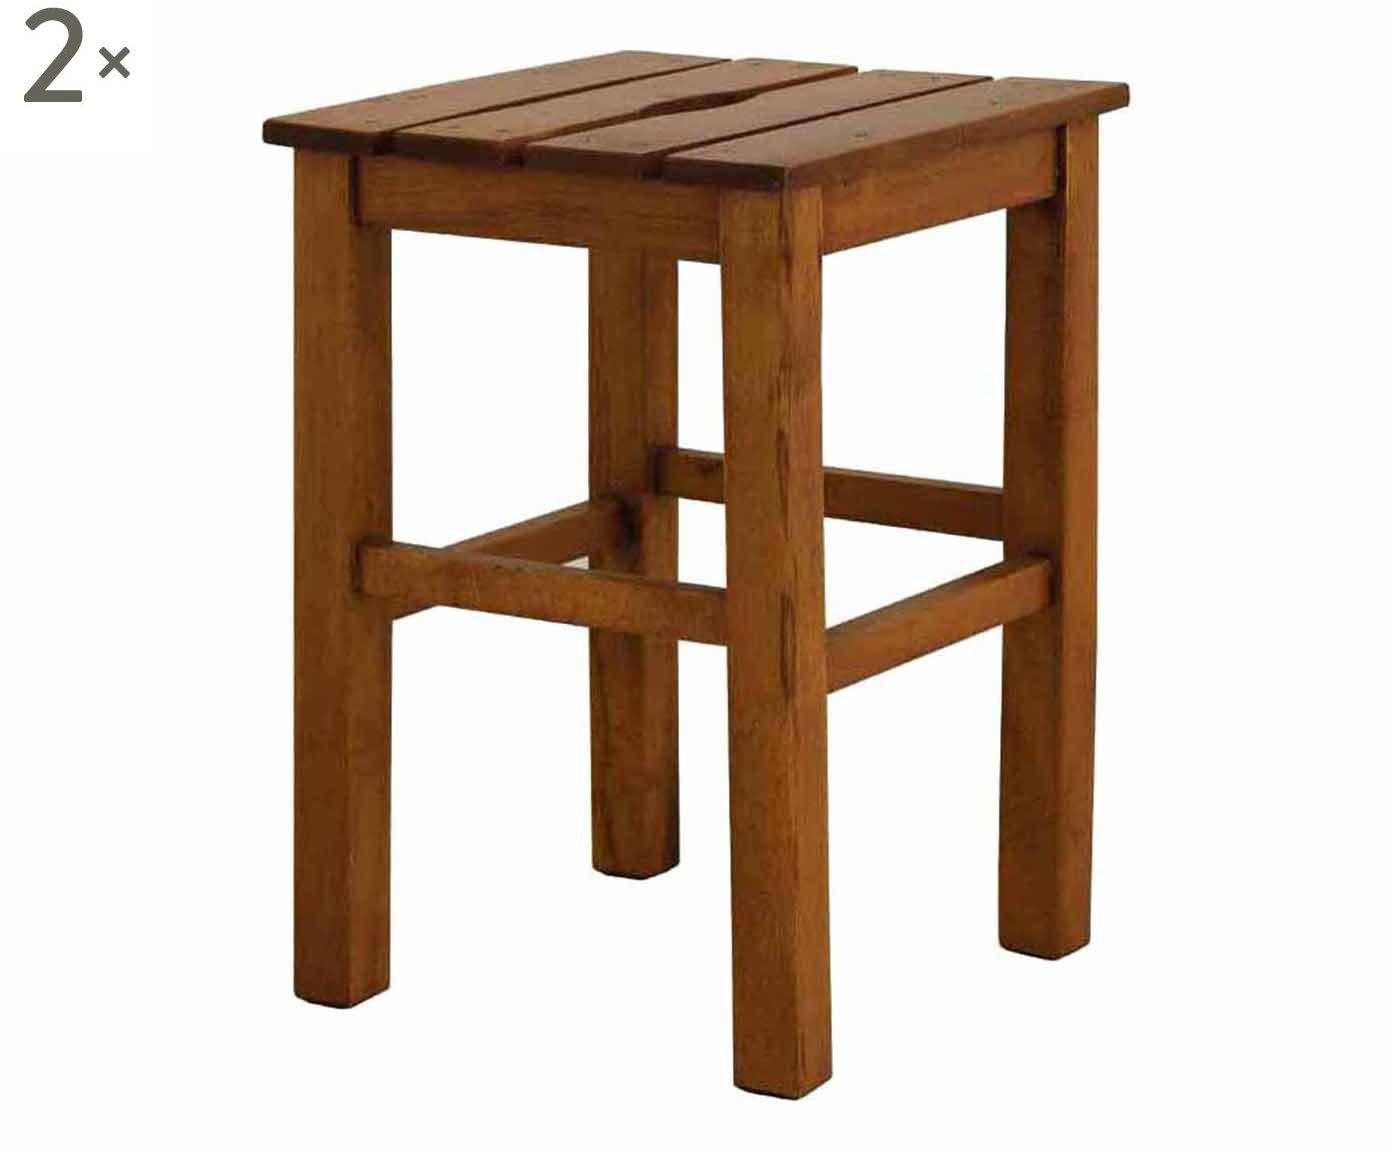 Set di 2 sgabelli in legno sauna 31x31x46 cm idee per casa nuova